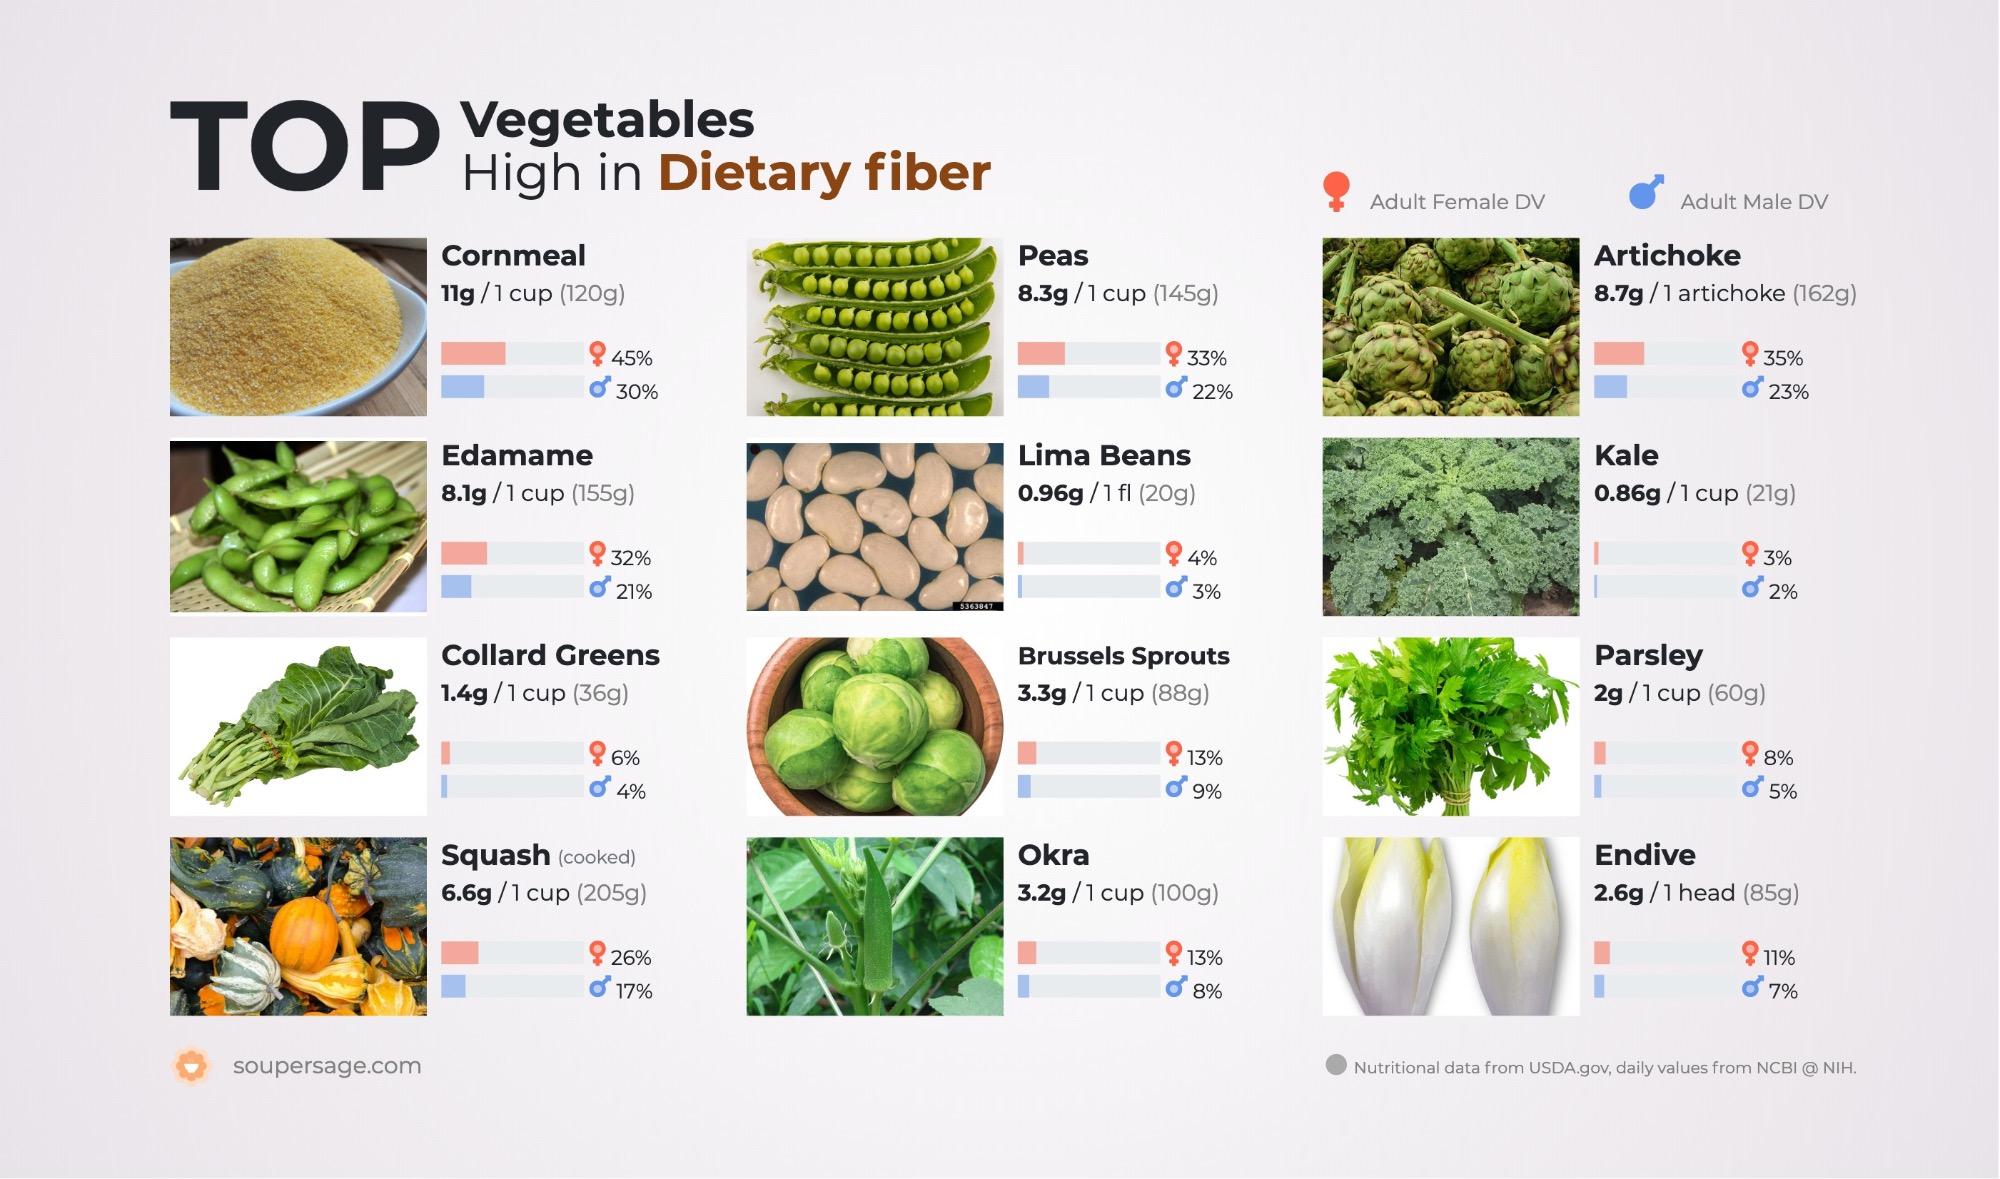 image of Top Vegetables High in Dietary fiber